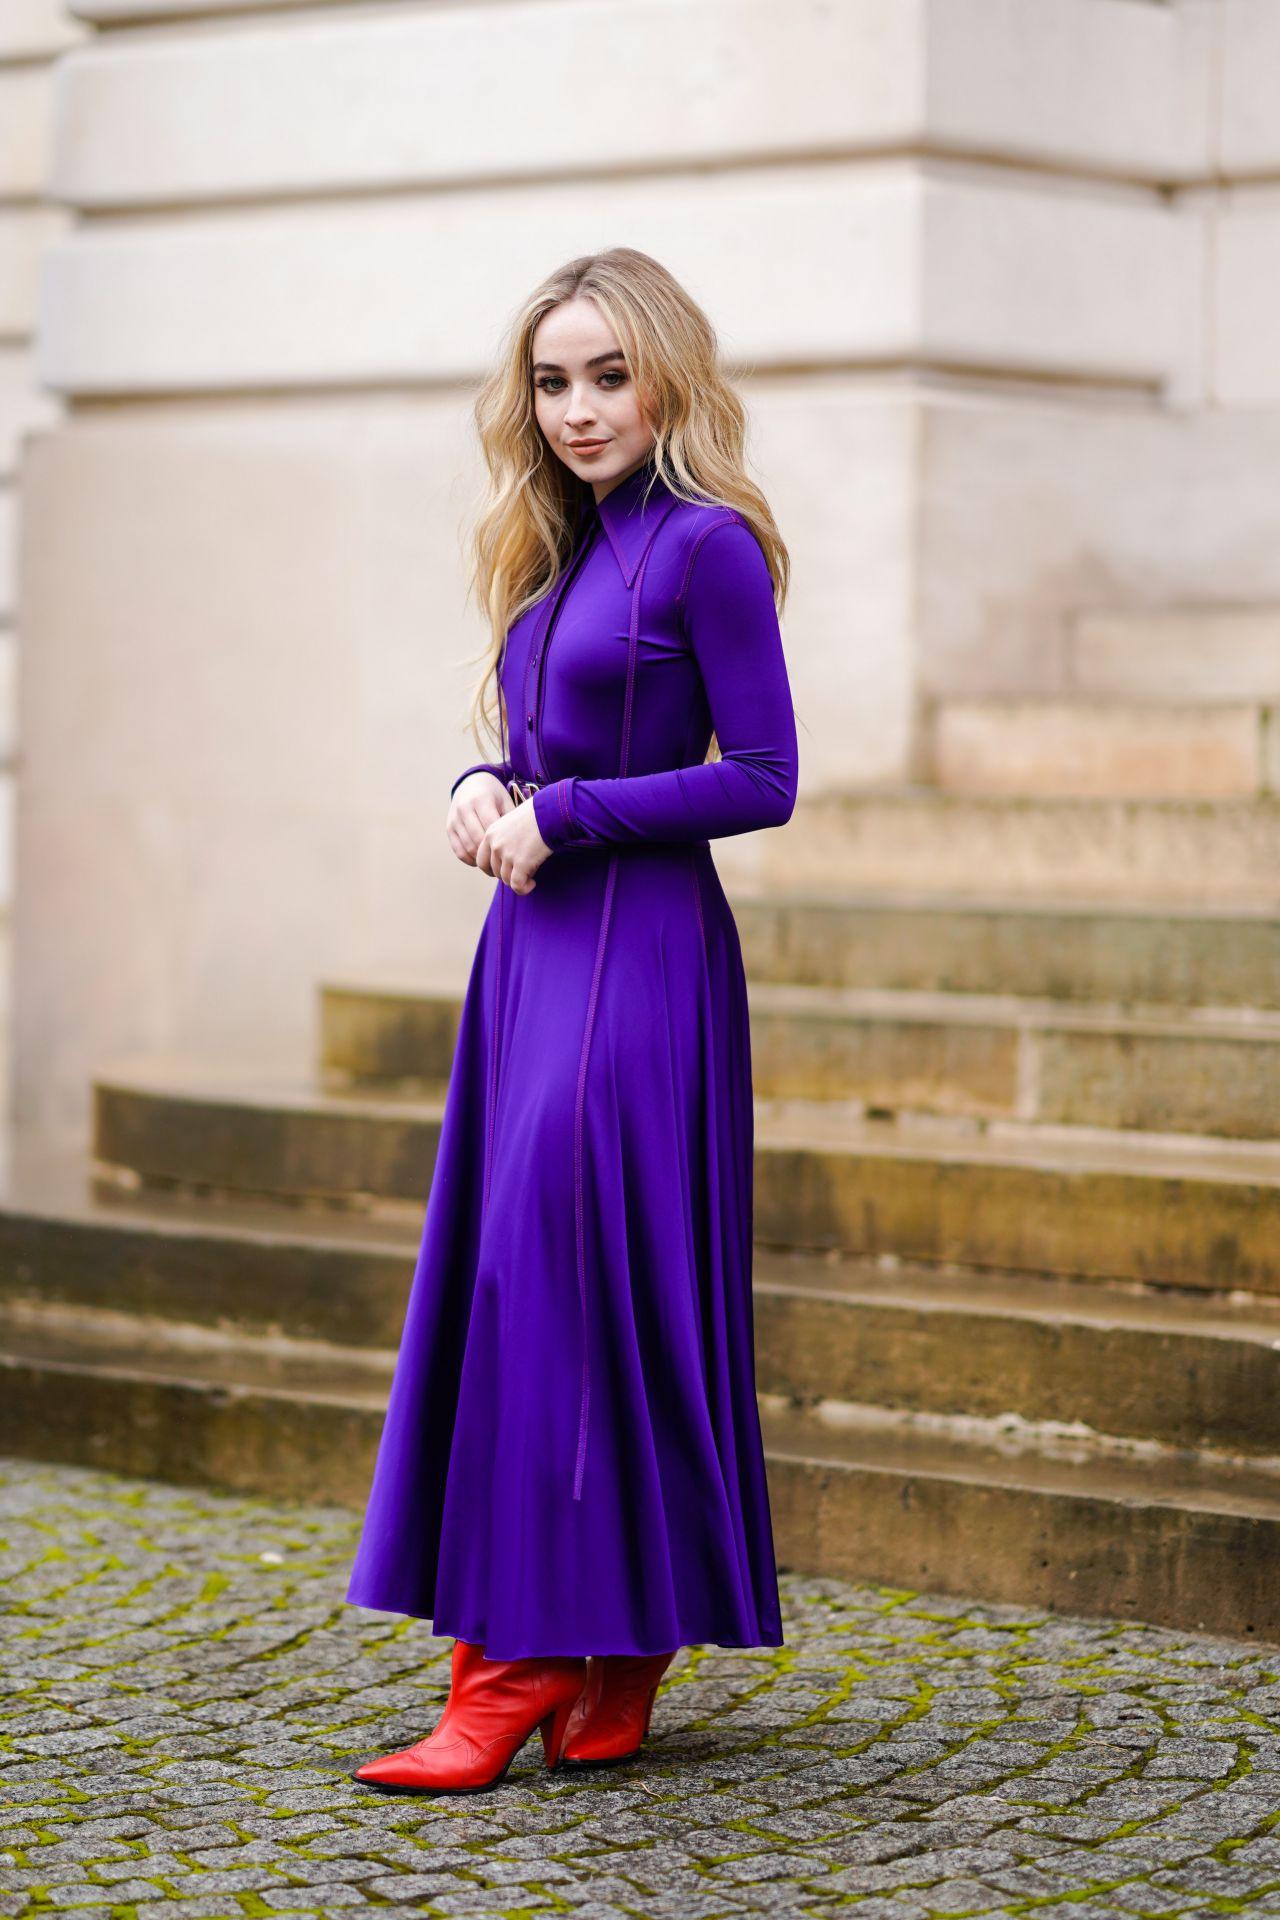 Sabrina Carpenter Nina Ricci Show Fw18 In Paris 03 02 2018